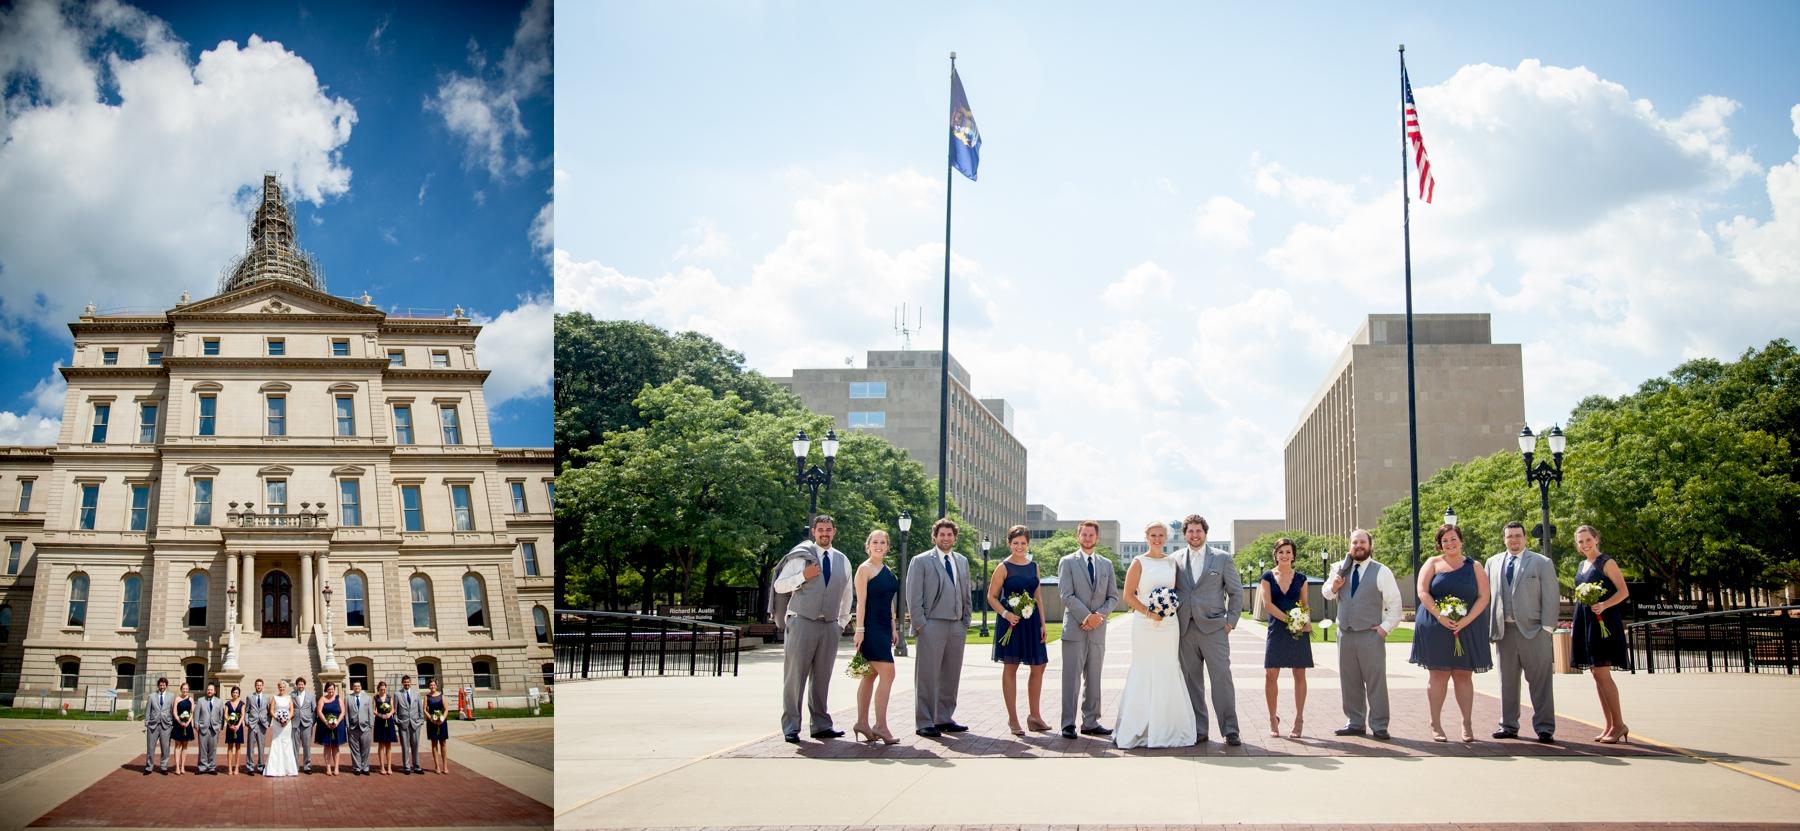 Brandon_Shafer_Photography_Chris_Lauren_Michigan_State_Capital_Wedding_0030.jpg